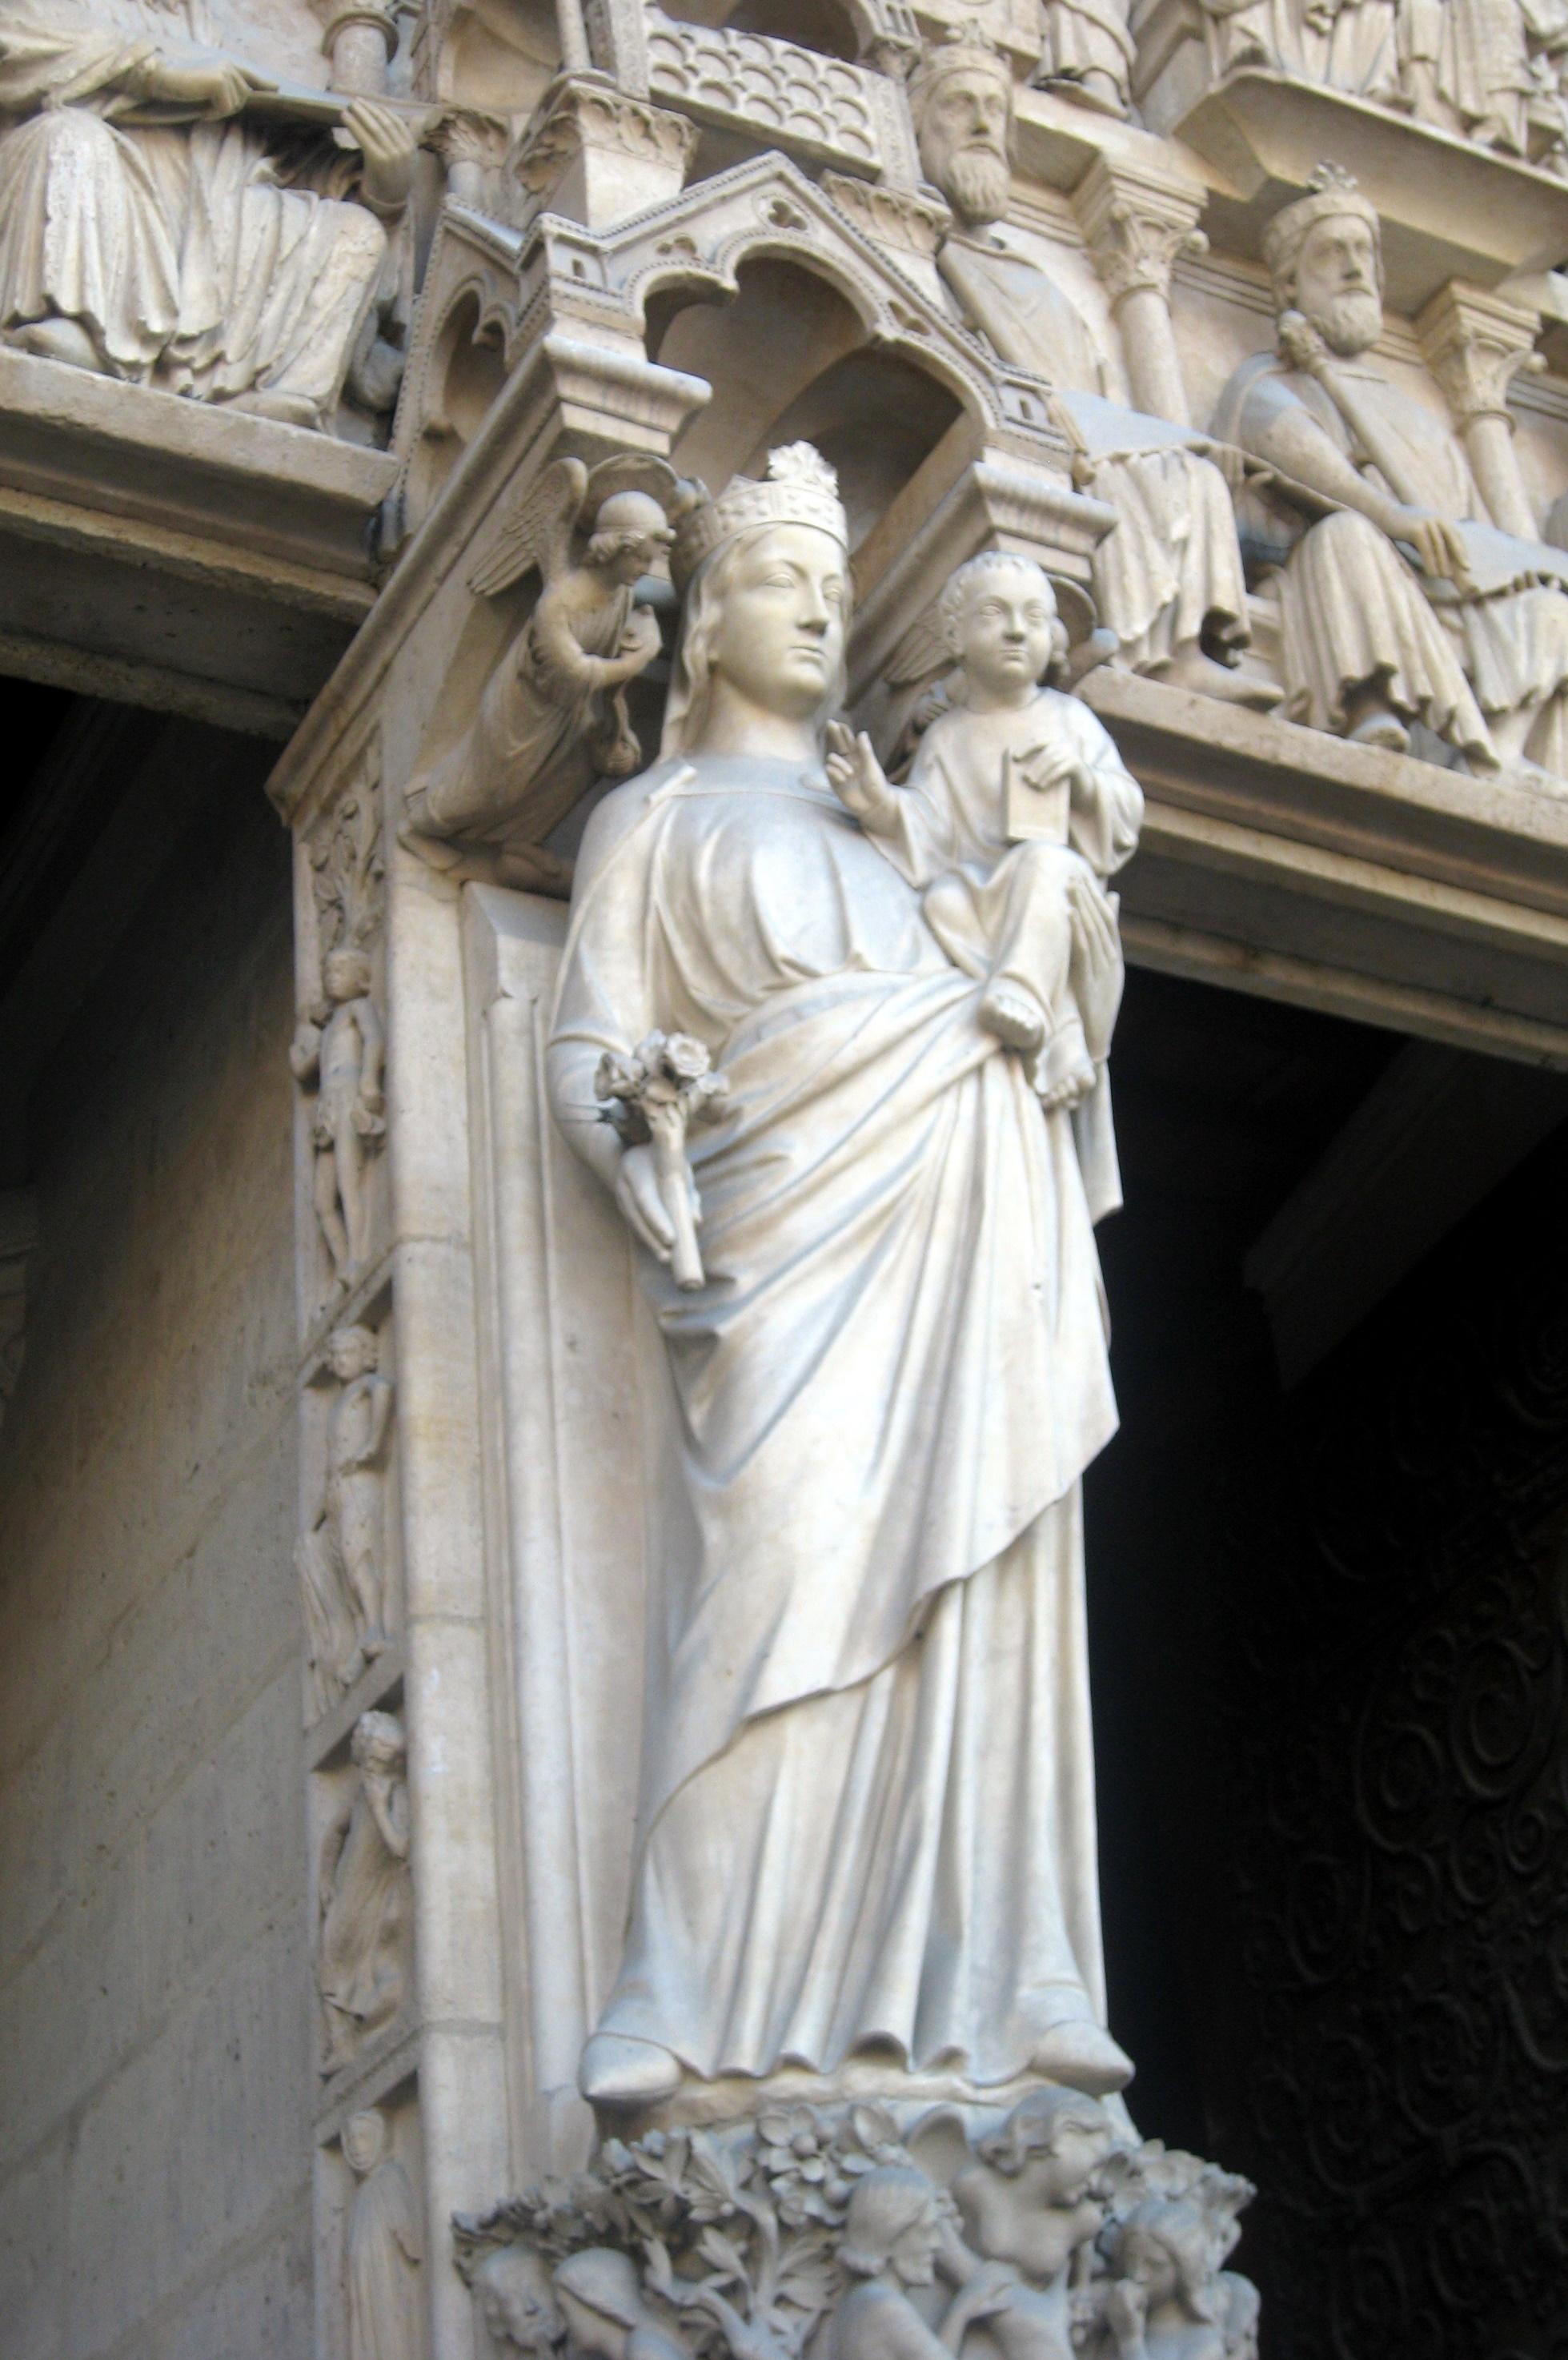 Portil de la Vierge_by wallyg (https://www.flickr.com/photos/wallyg/)